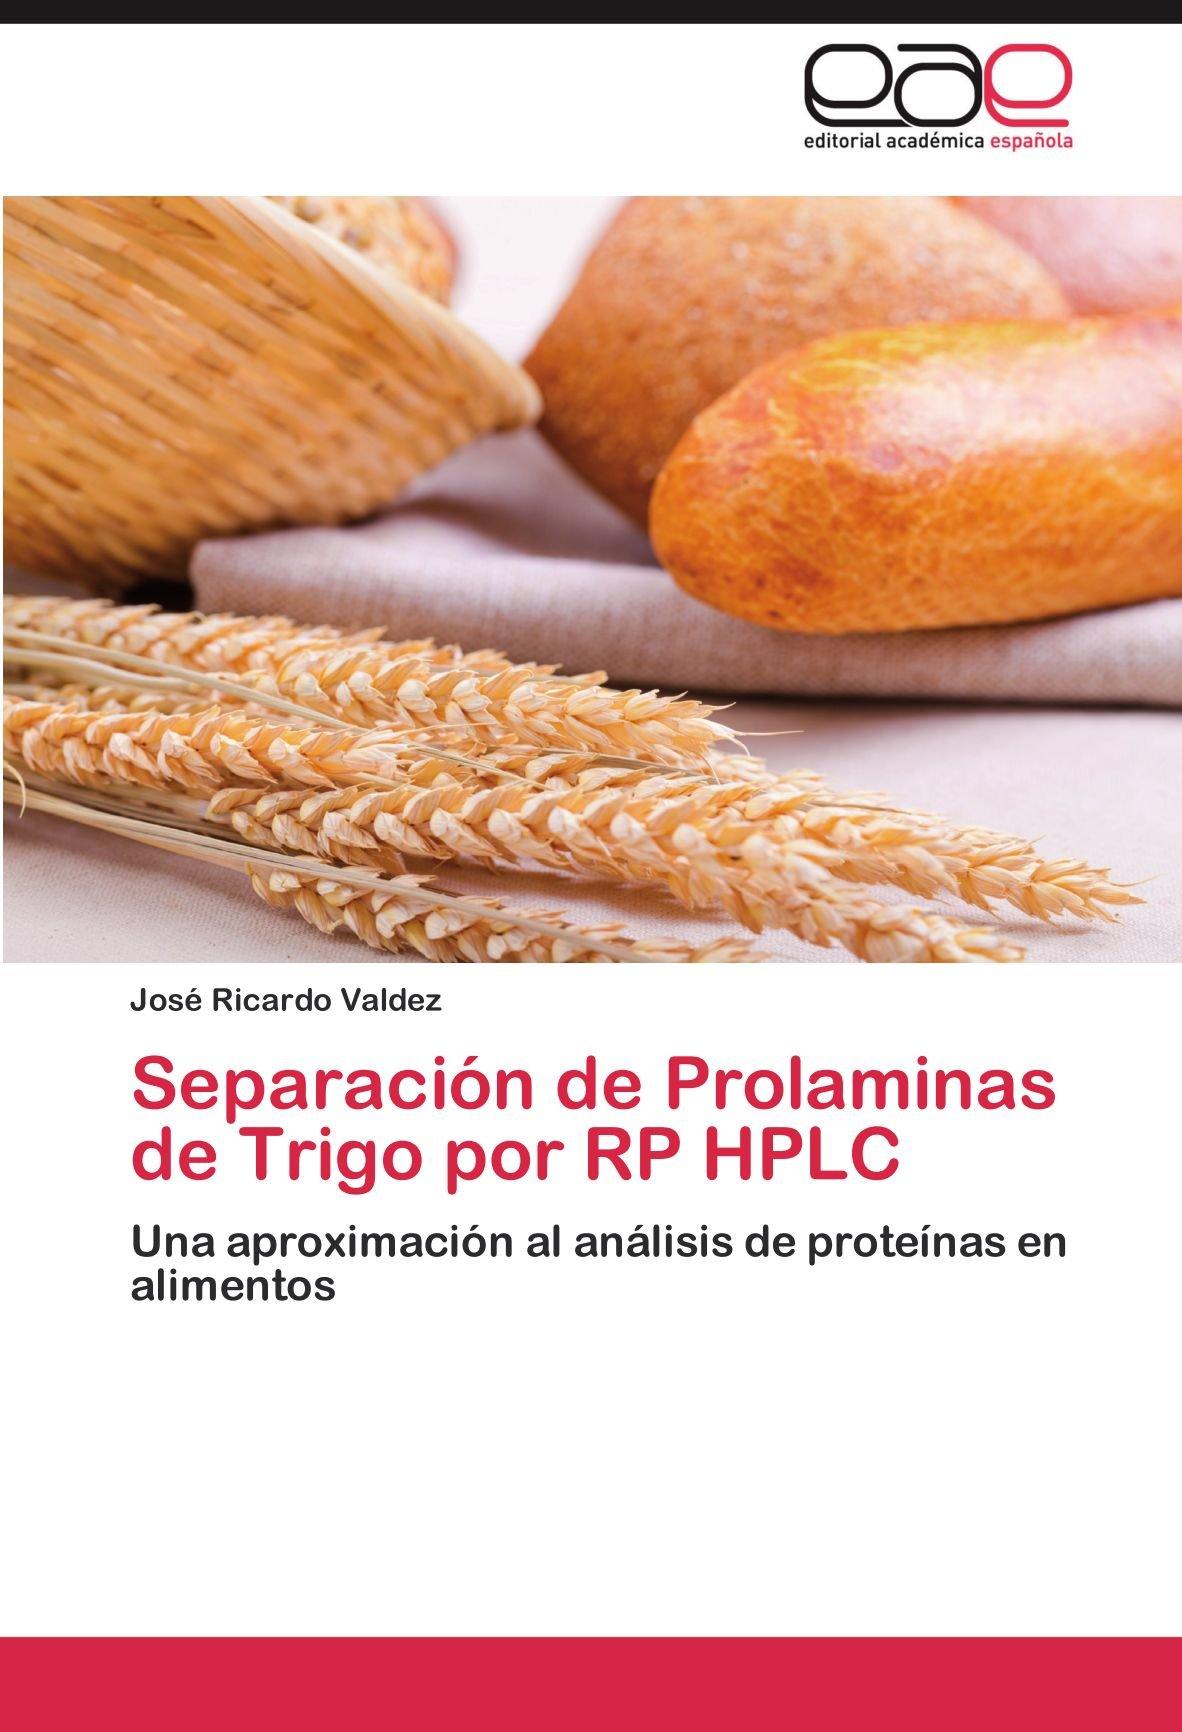 Separacion de Prolaminas de Trigo Por Rp HPLC: Amazon.es: Jos Ricardo Valdez, Jose Ricardo Valdez: Libros